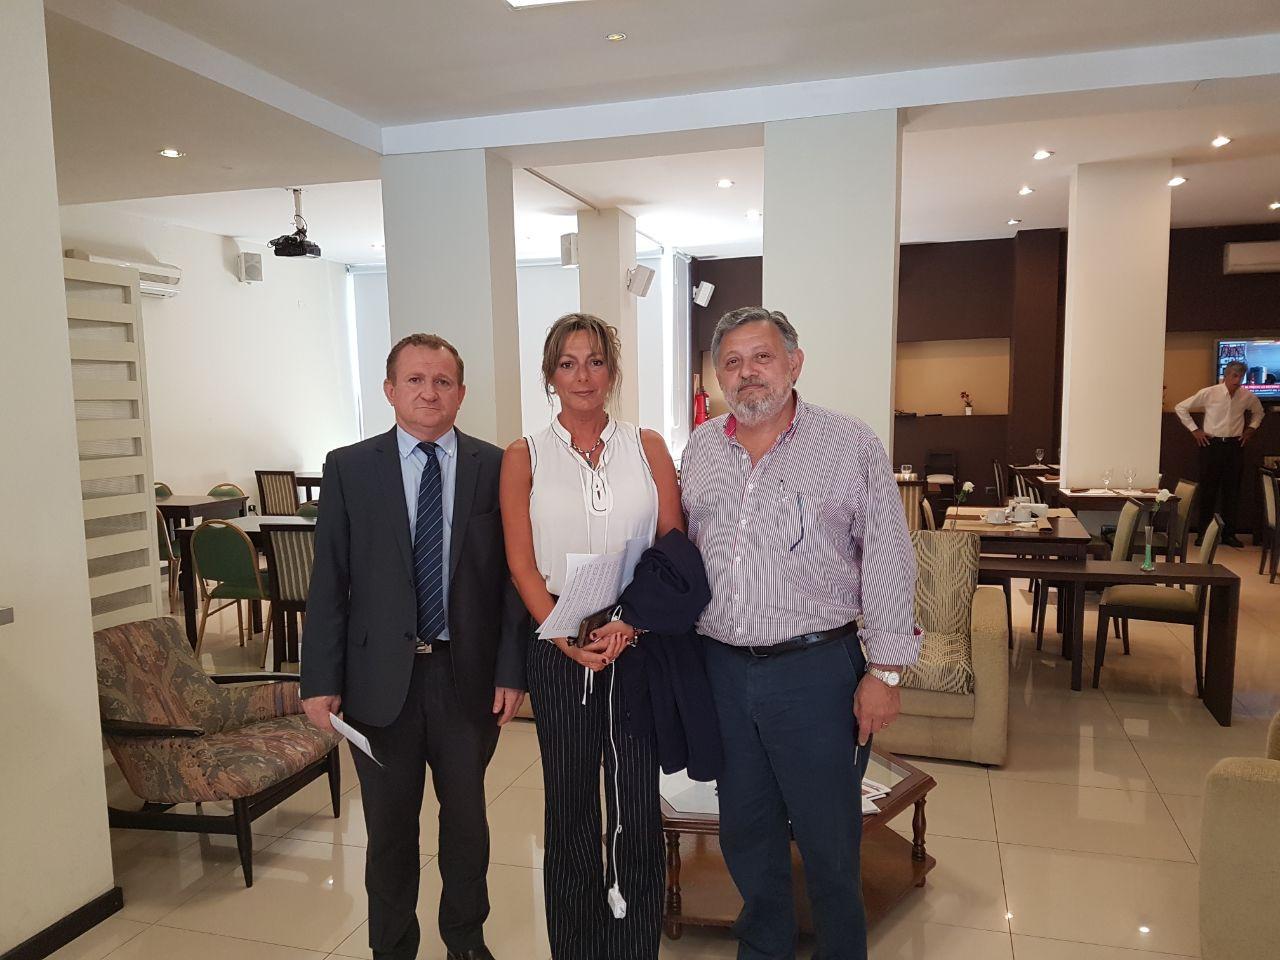 reunion-de-la-defensora-provincial-con-autoridades-de-reconquista-227